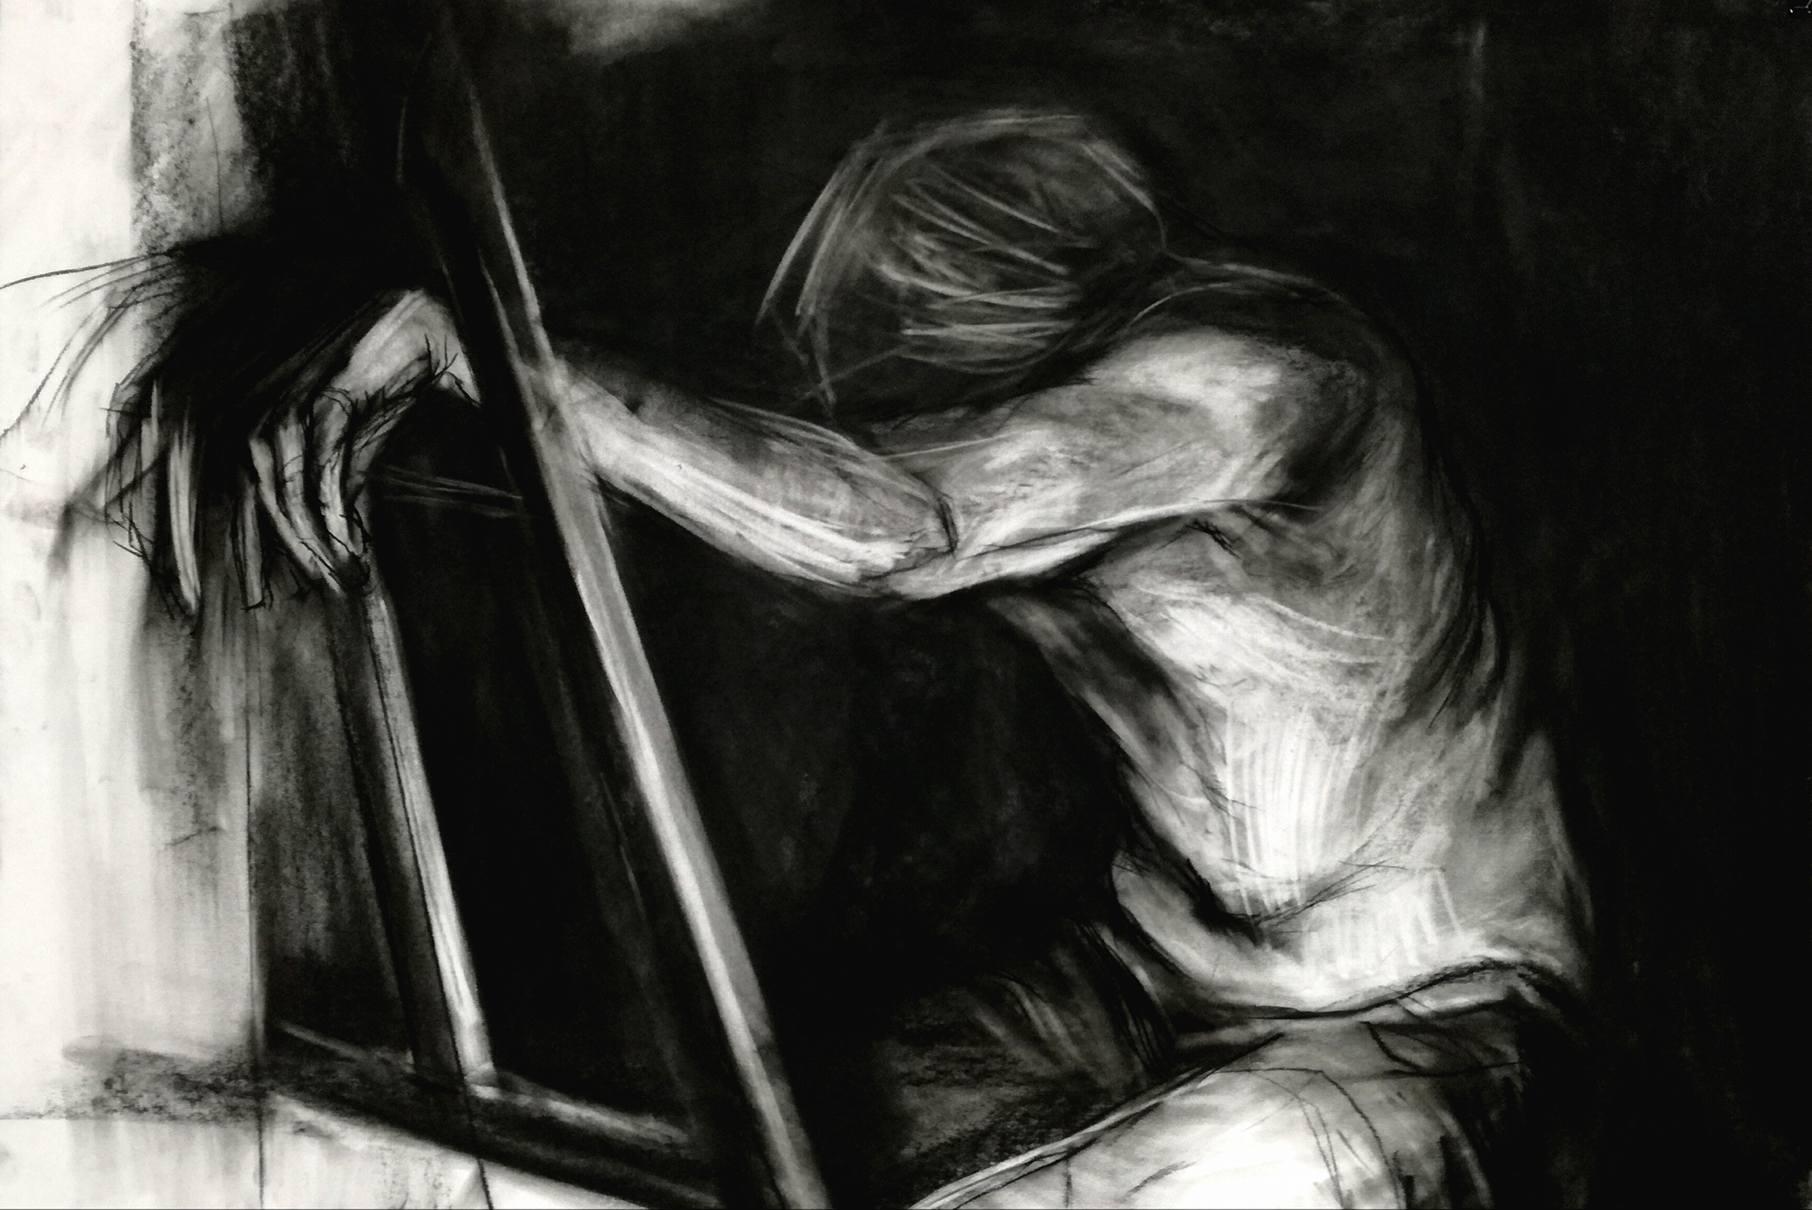 ekspresyjny rysunek węglem